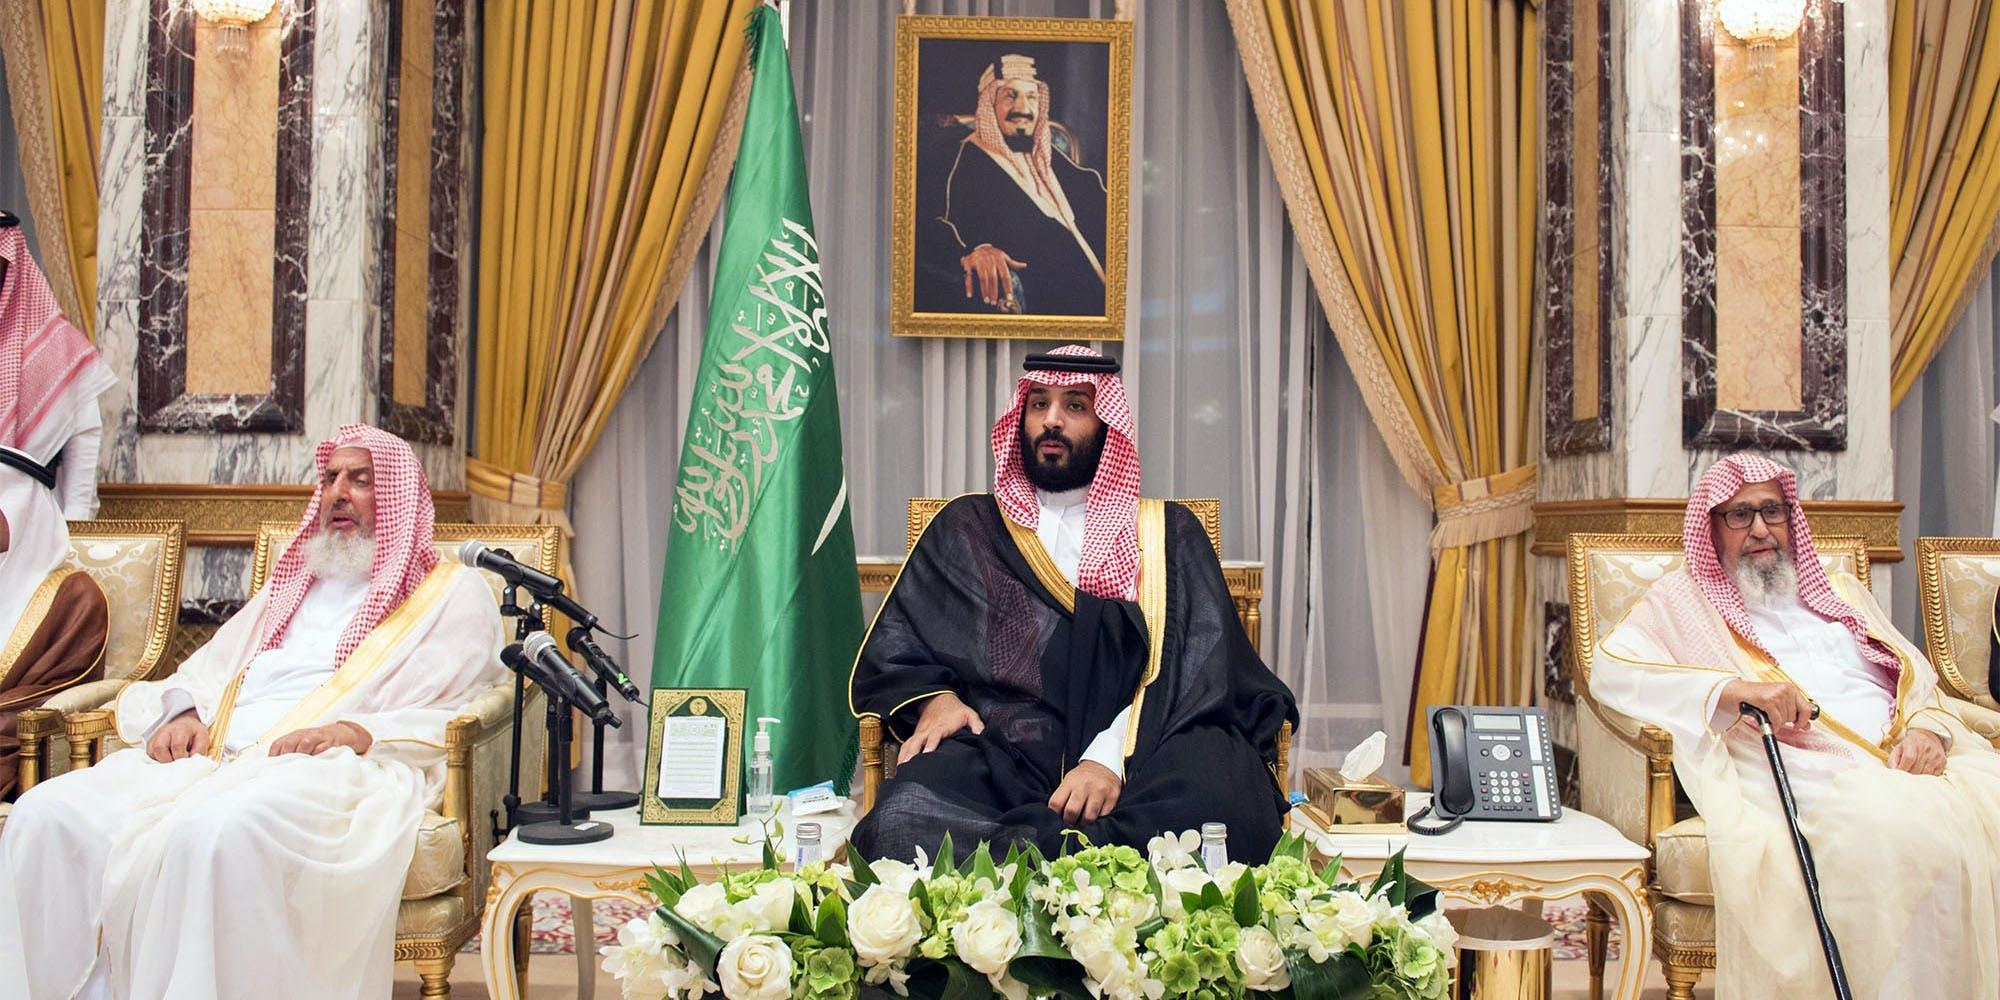 Saudi Arabia's Government Purge — And How Washington Corruption Enabled It